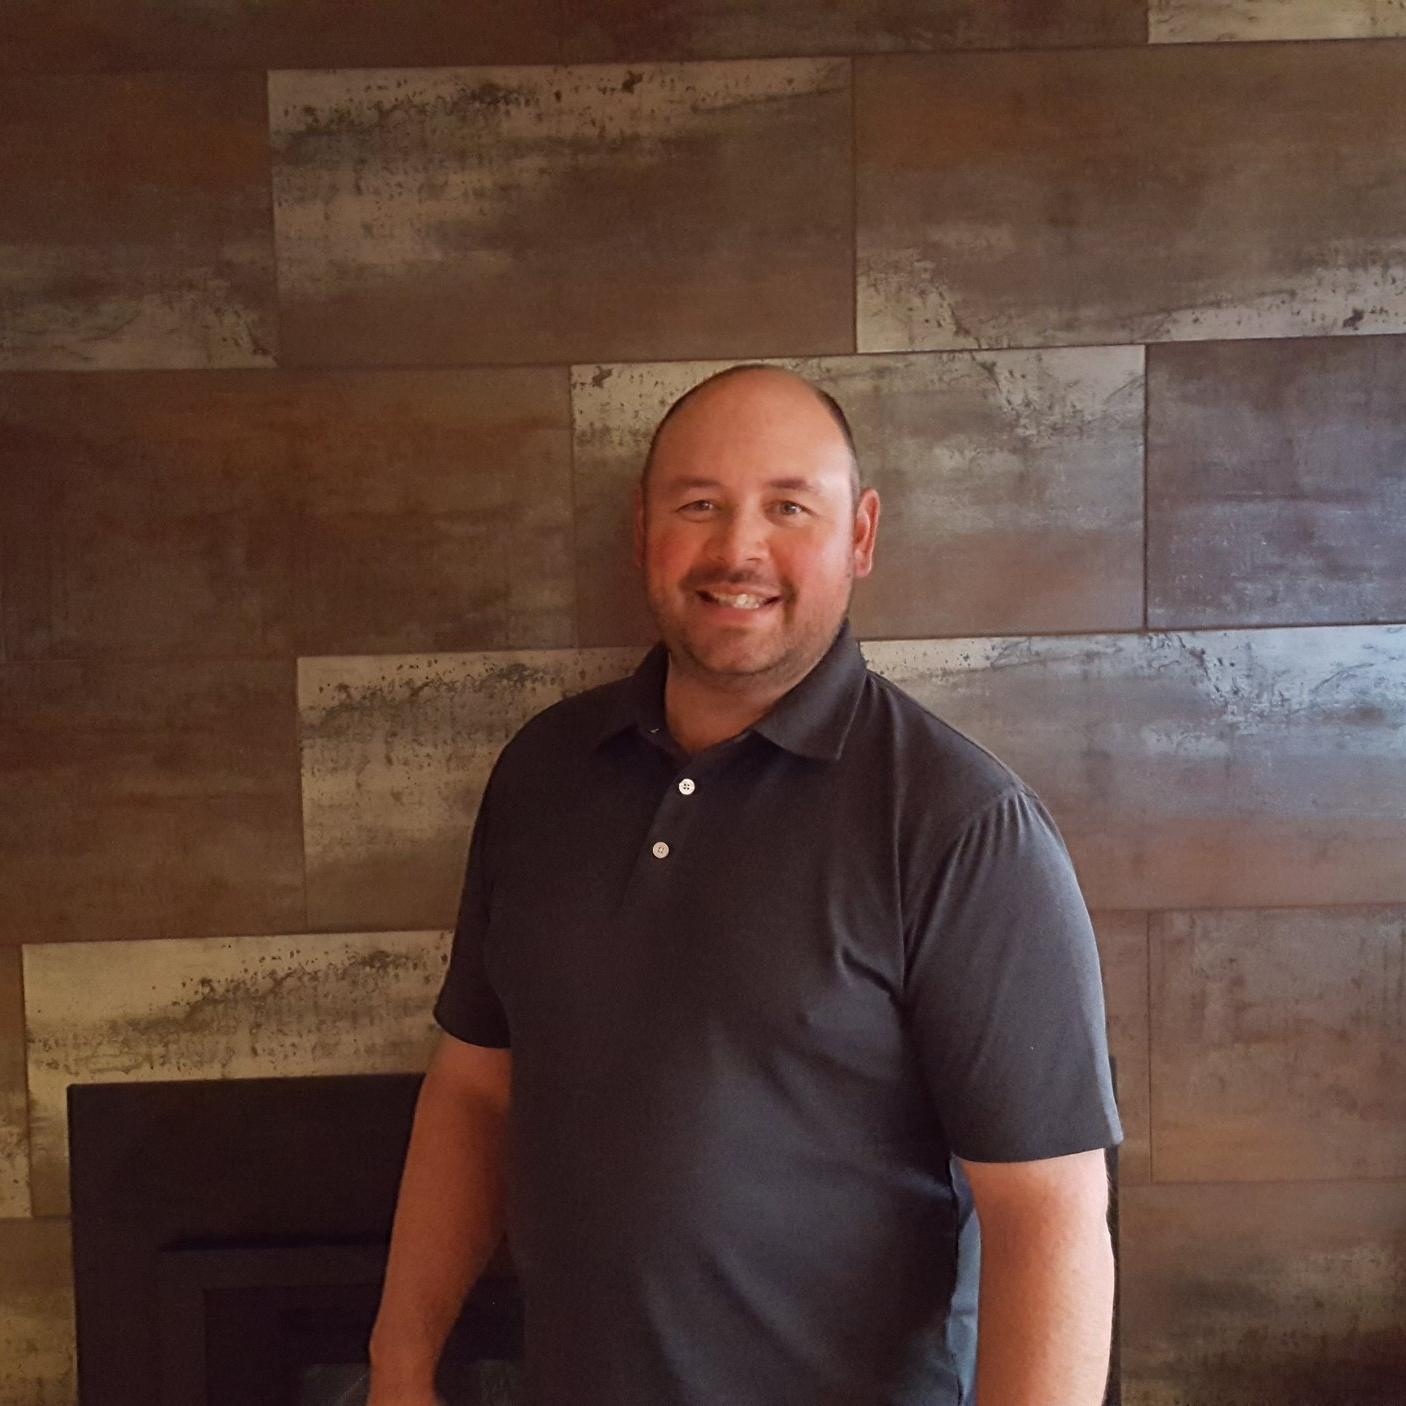 David Carroll, President / General Manager